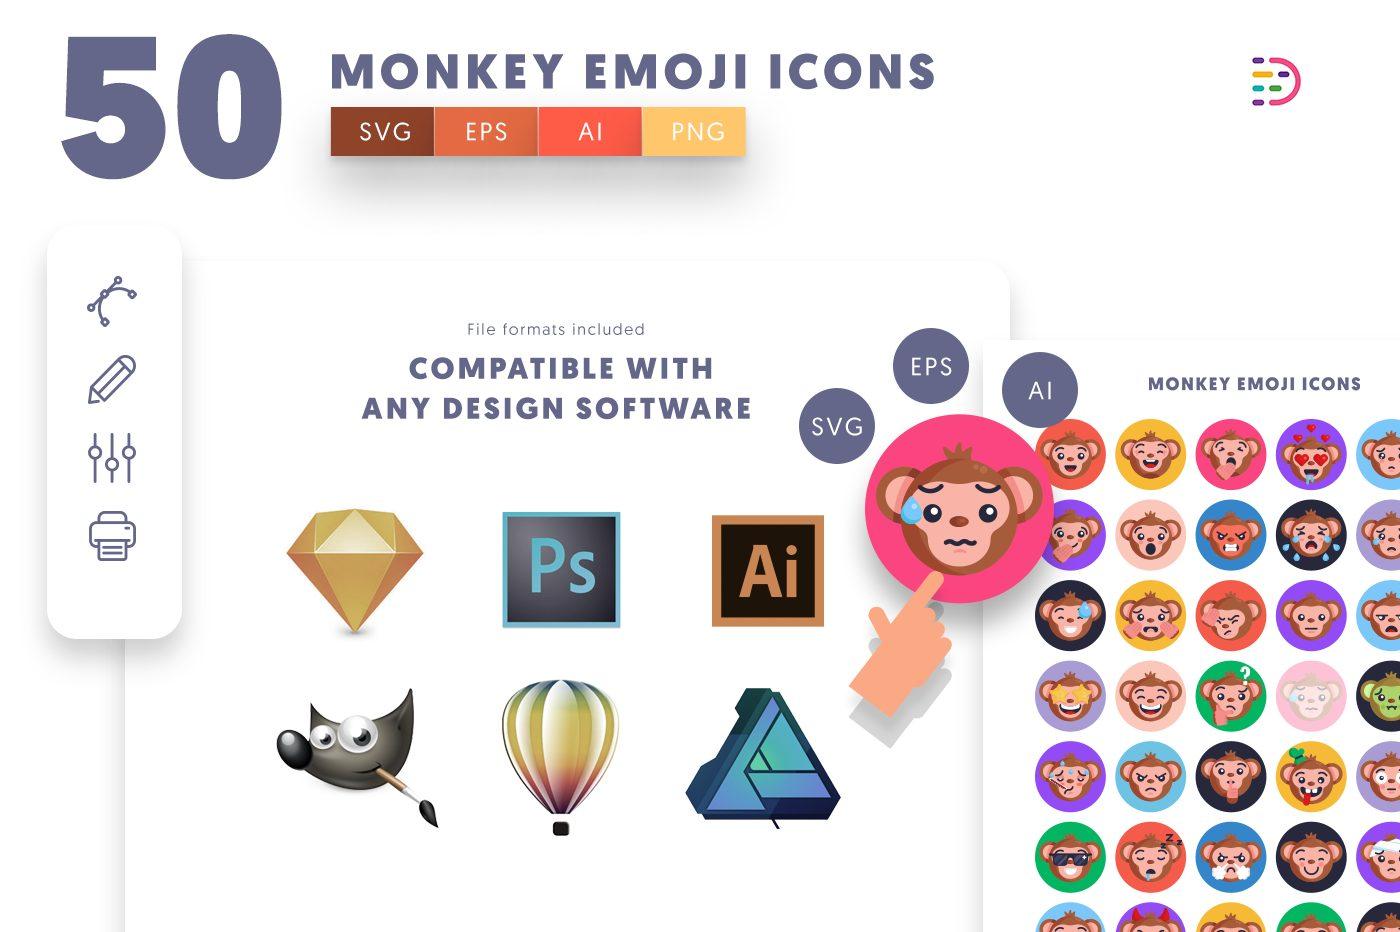 full vector 50 Monkey Emoji Icons EPS, SVG, PNG